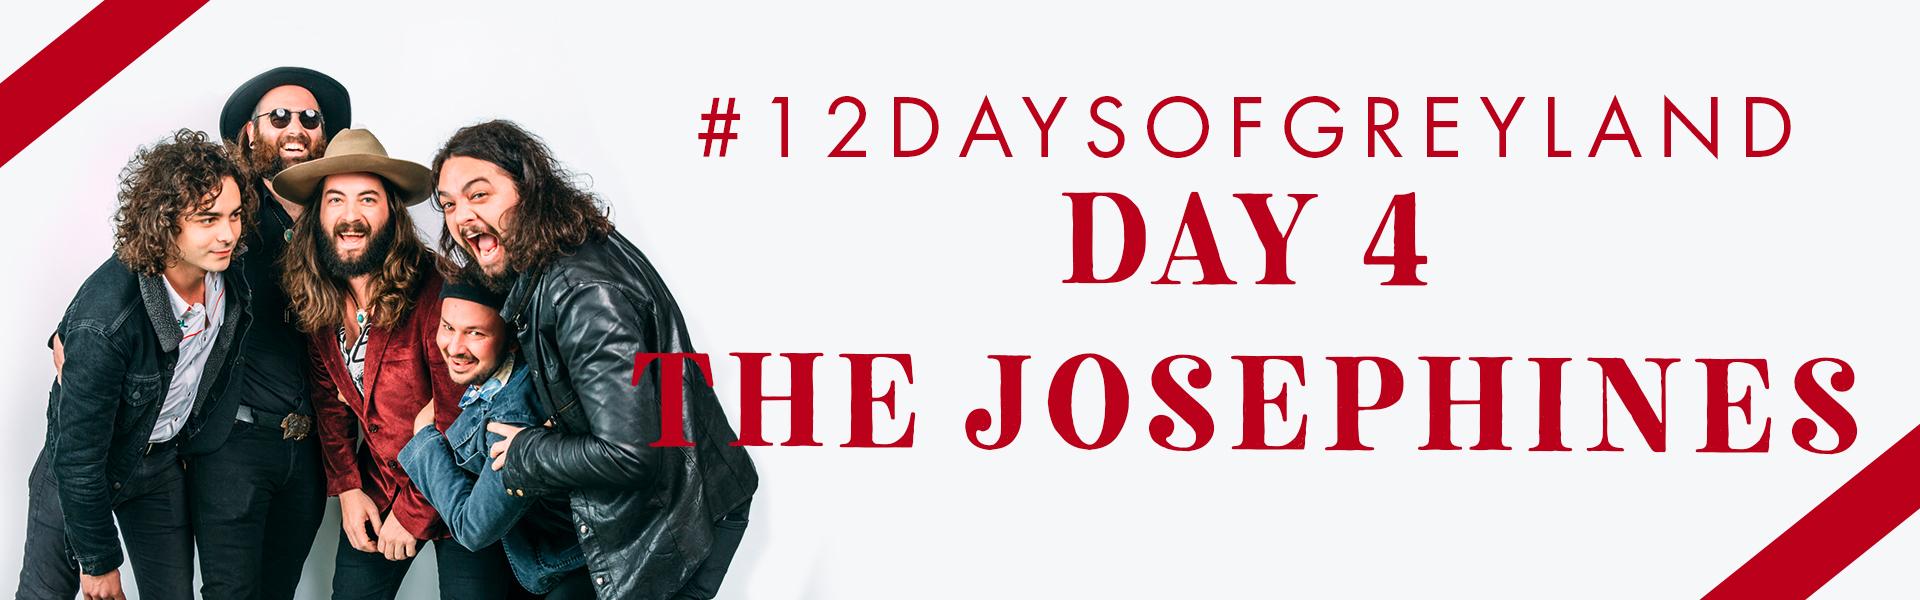 12days_josephines_banner.jpg